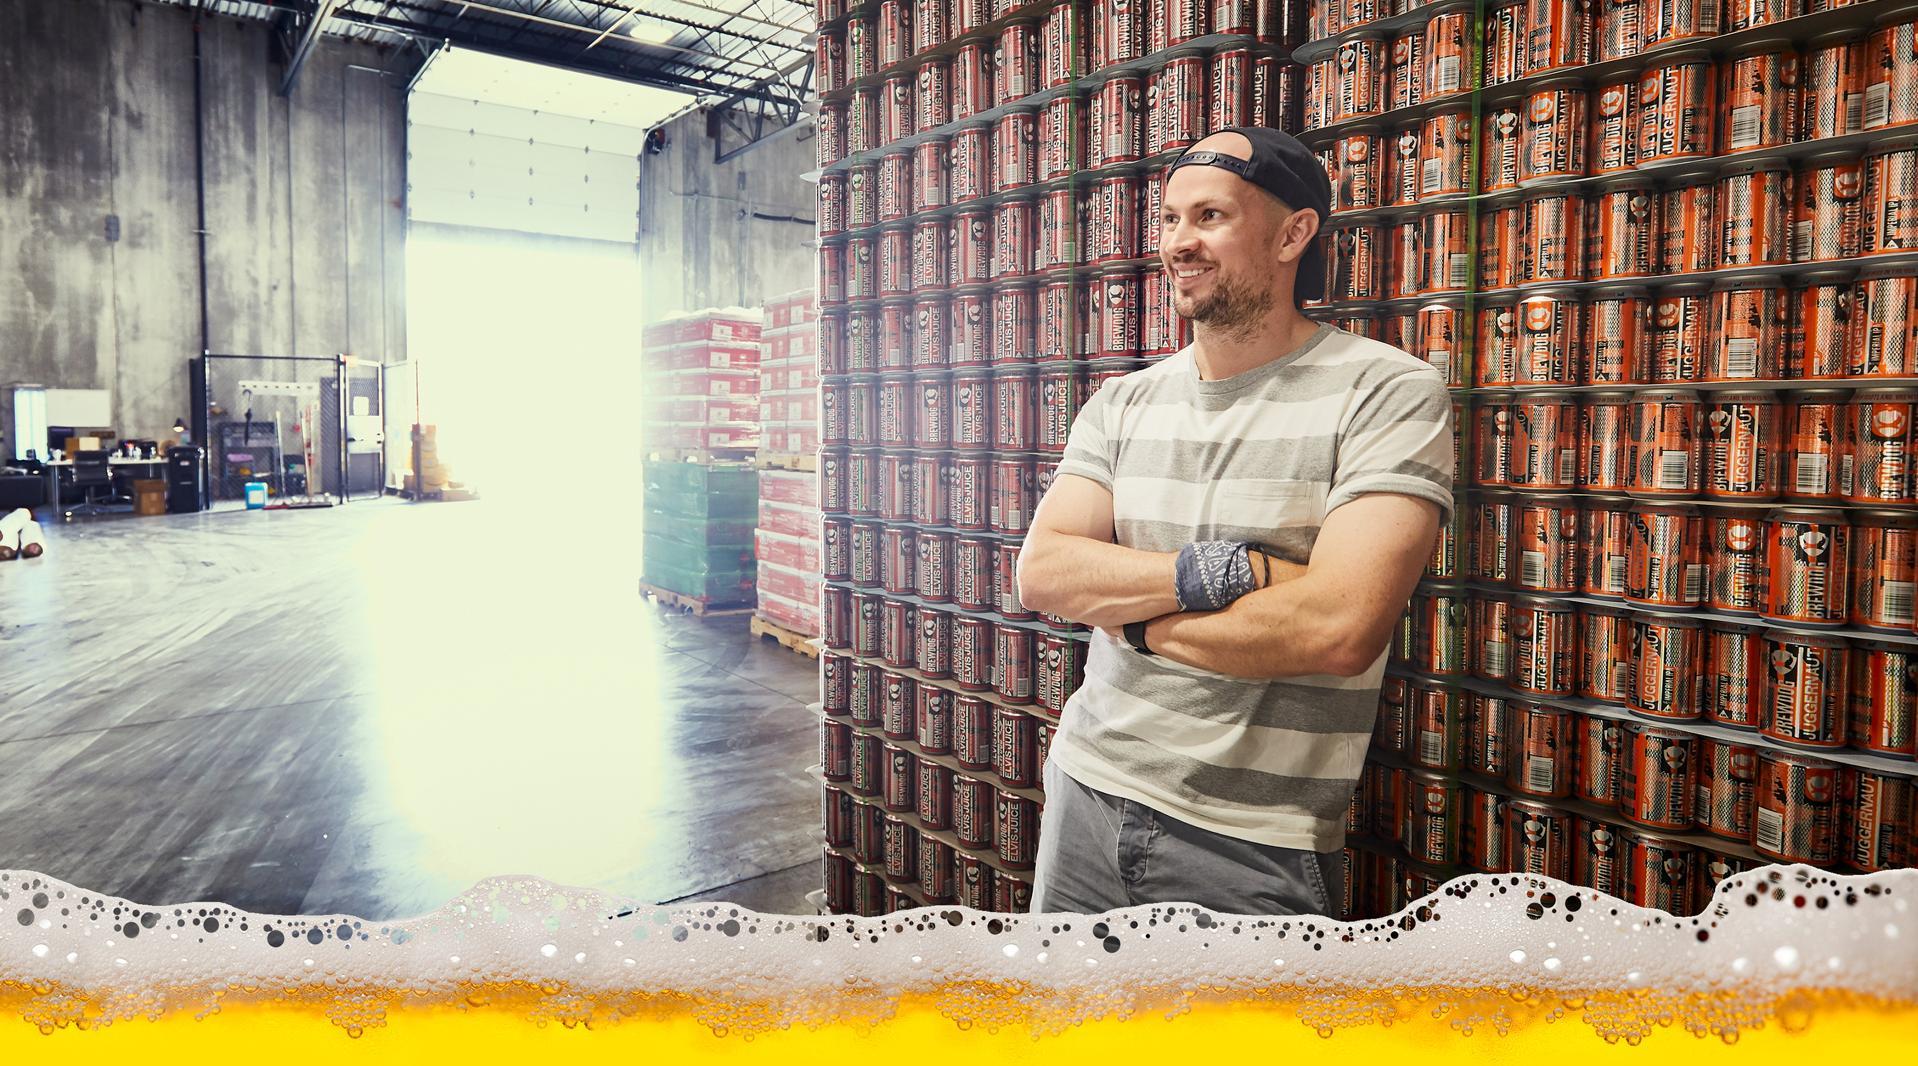 hero-brewdog-James-Watt-by-Franco-Vogt_0406HR